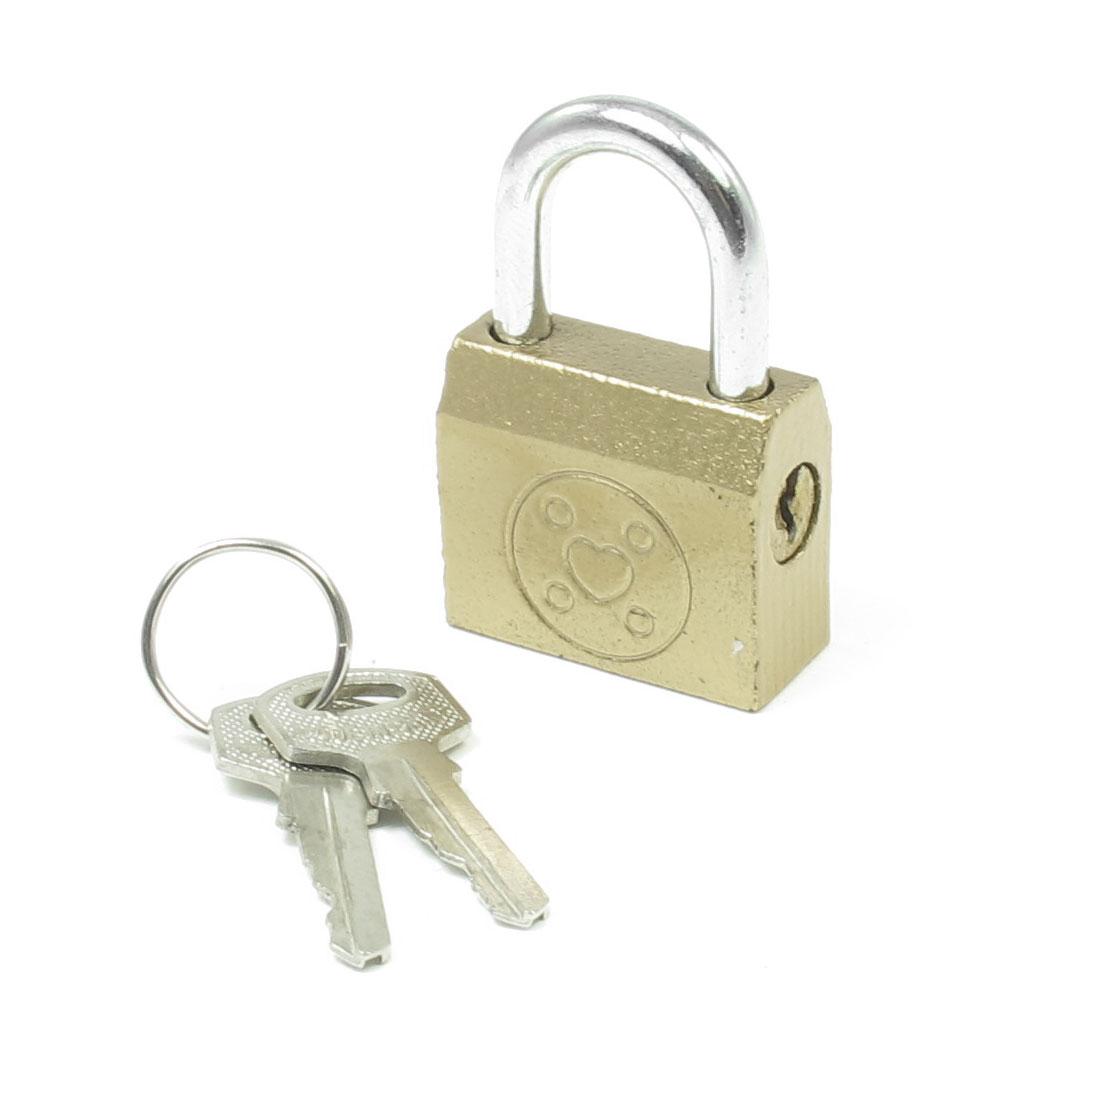 Toolbox Cabinet Door Security Lock Padlock Copper Tone w 2 Keys